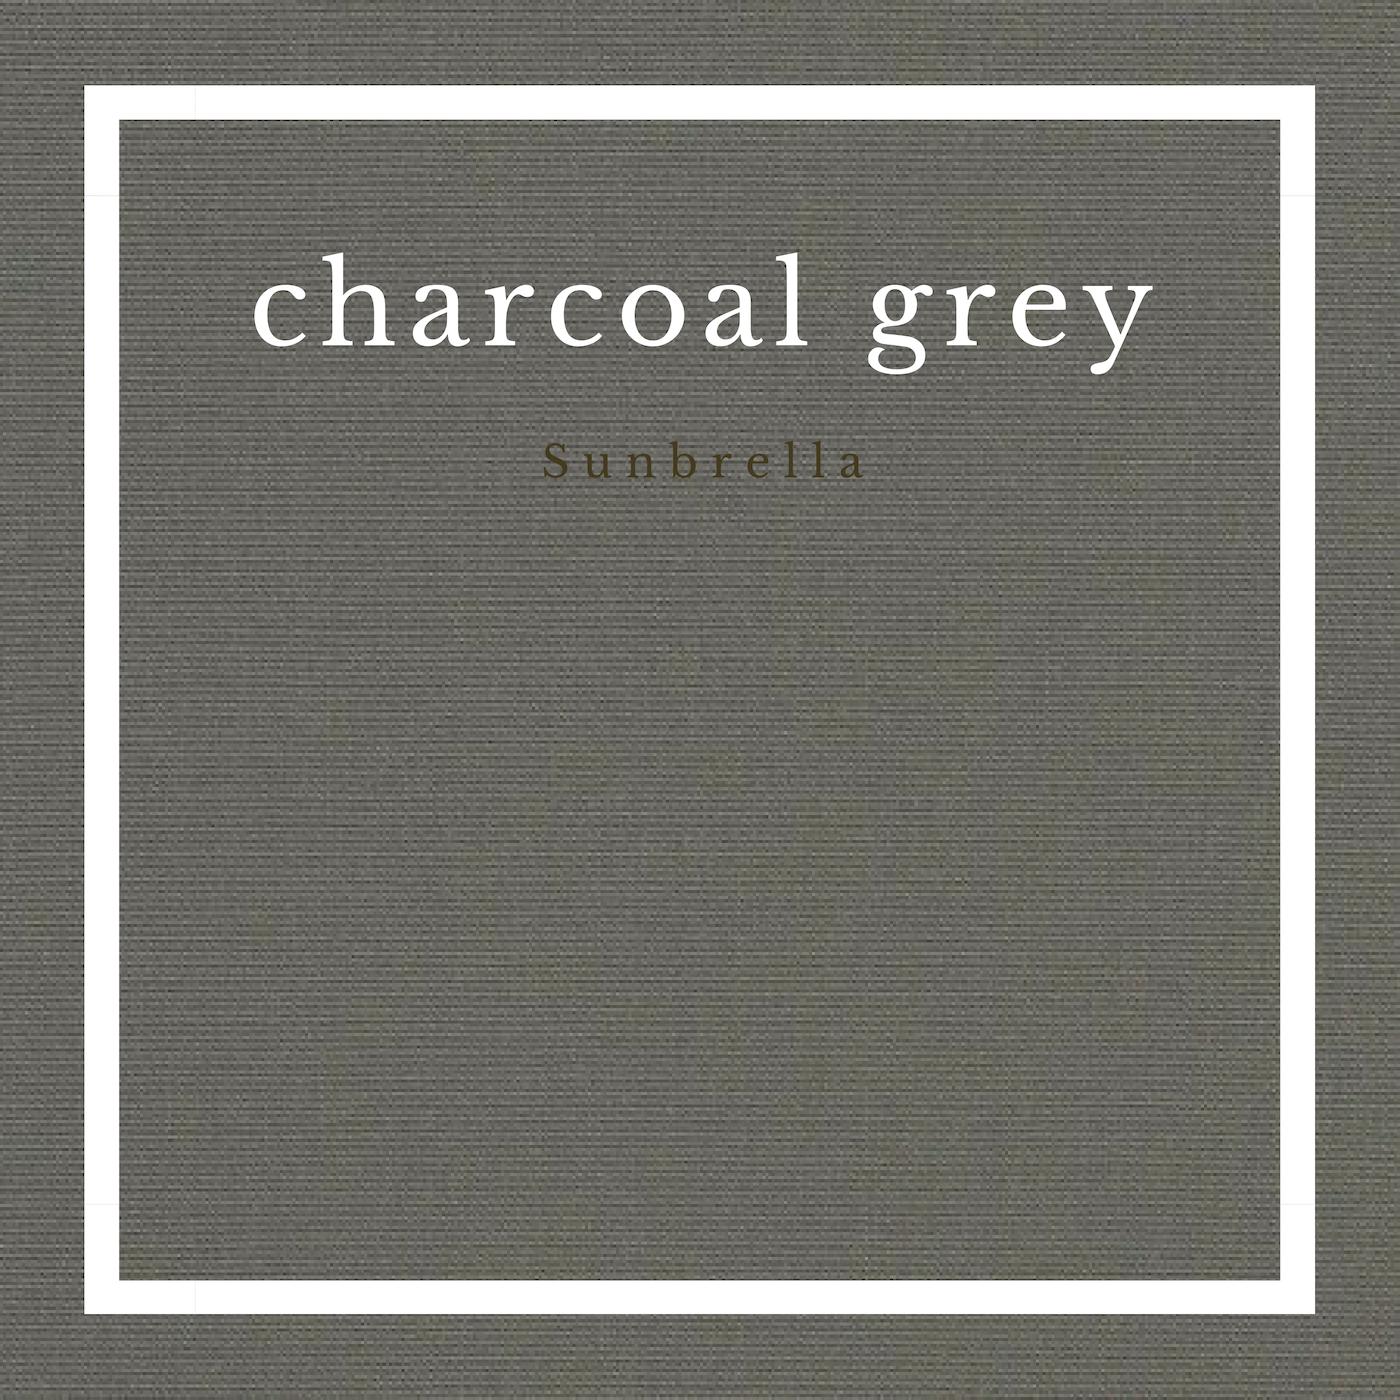 charcoal-grey-sunbrella ledge lounger